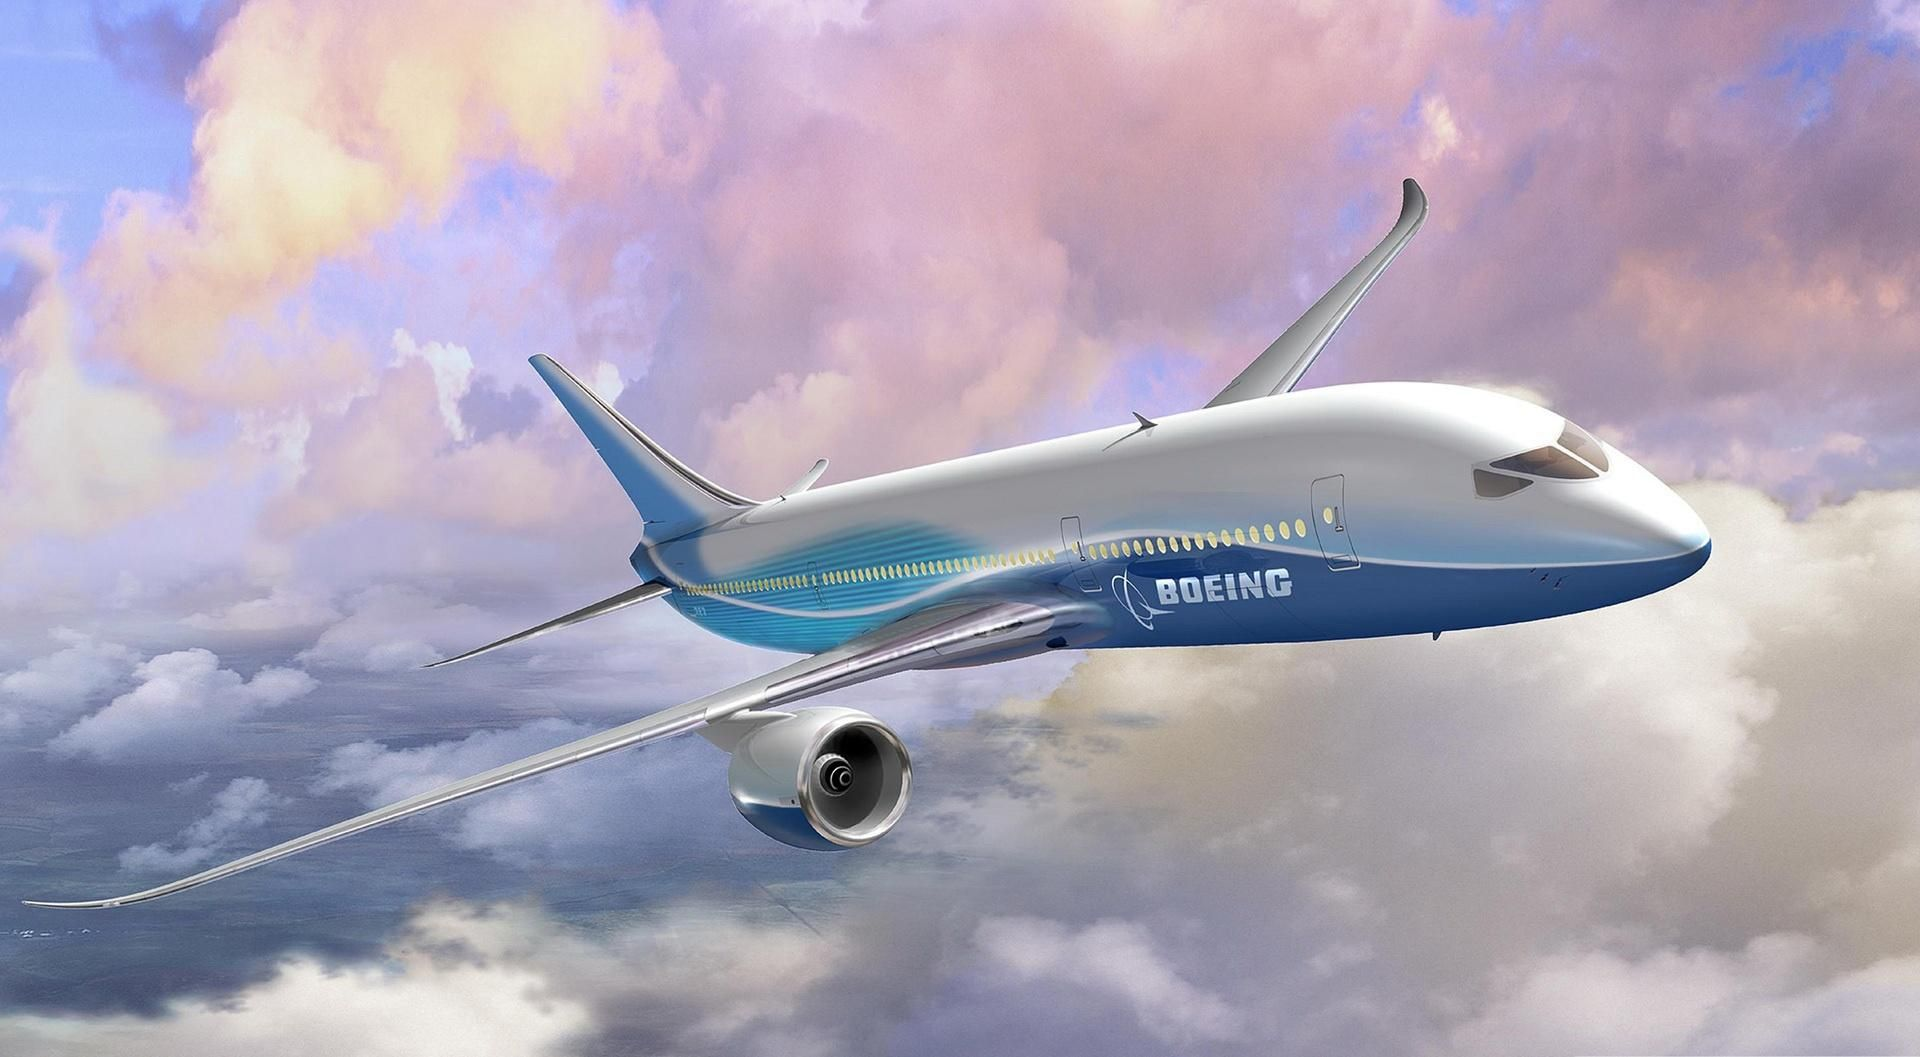 boeing_787_dreamliner_2wallpaper1920x1080 Boeing 787